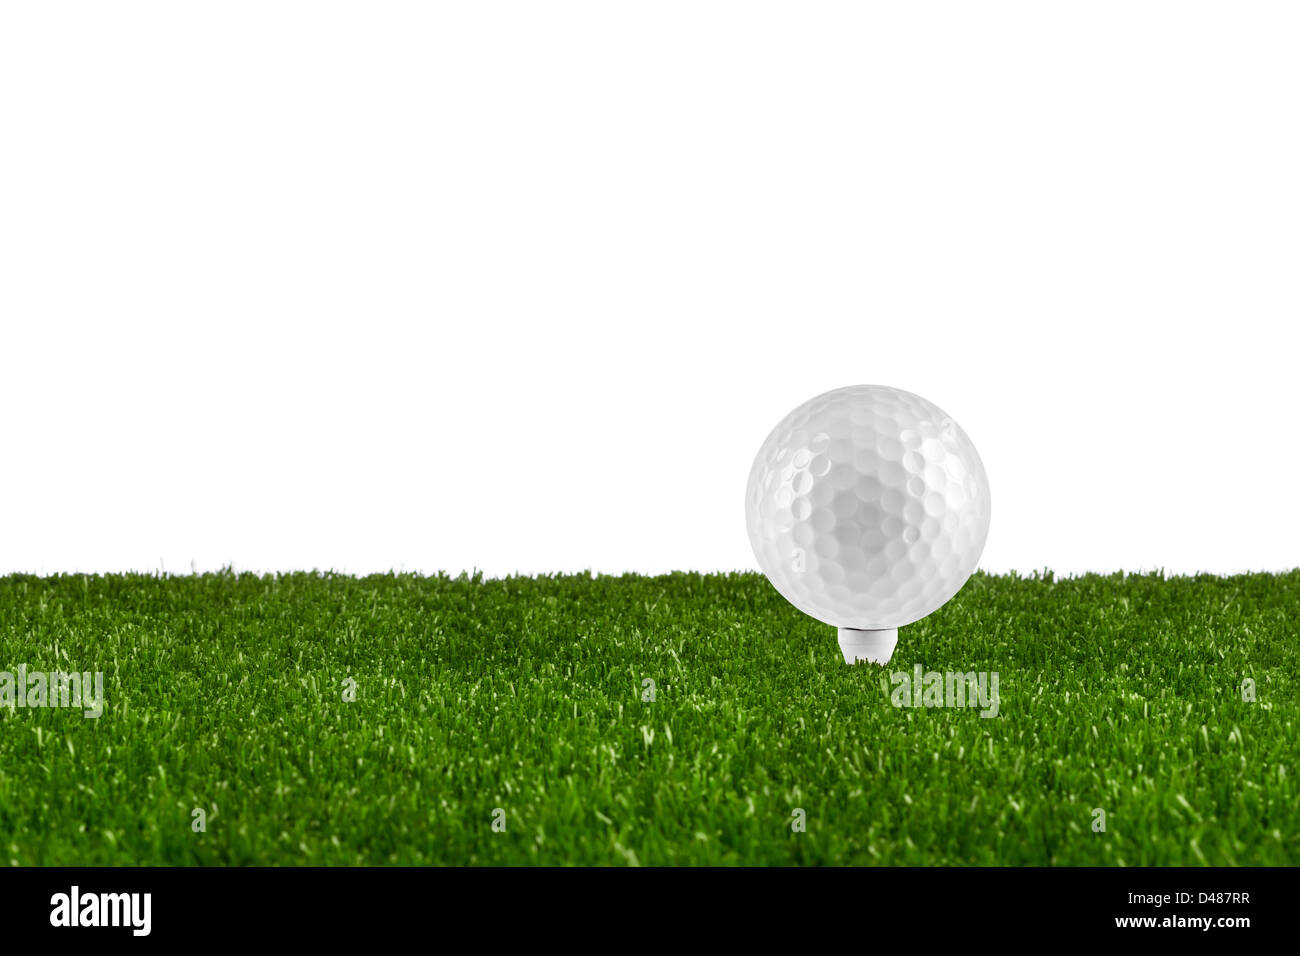 golf ball on tee on grass - Stock Image